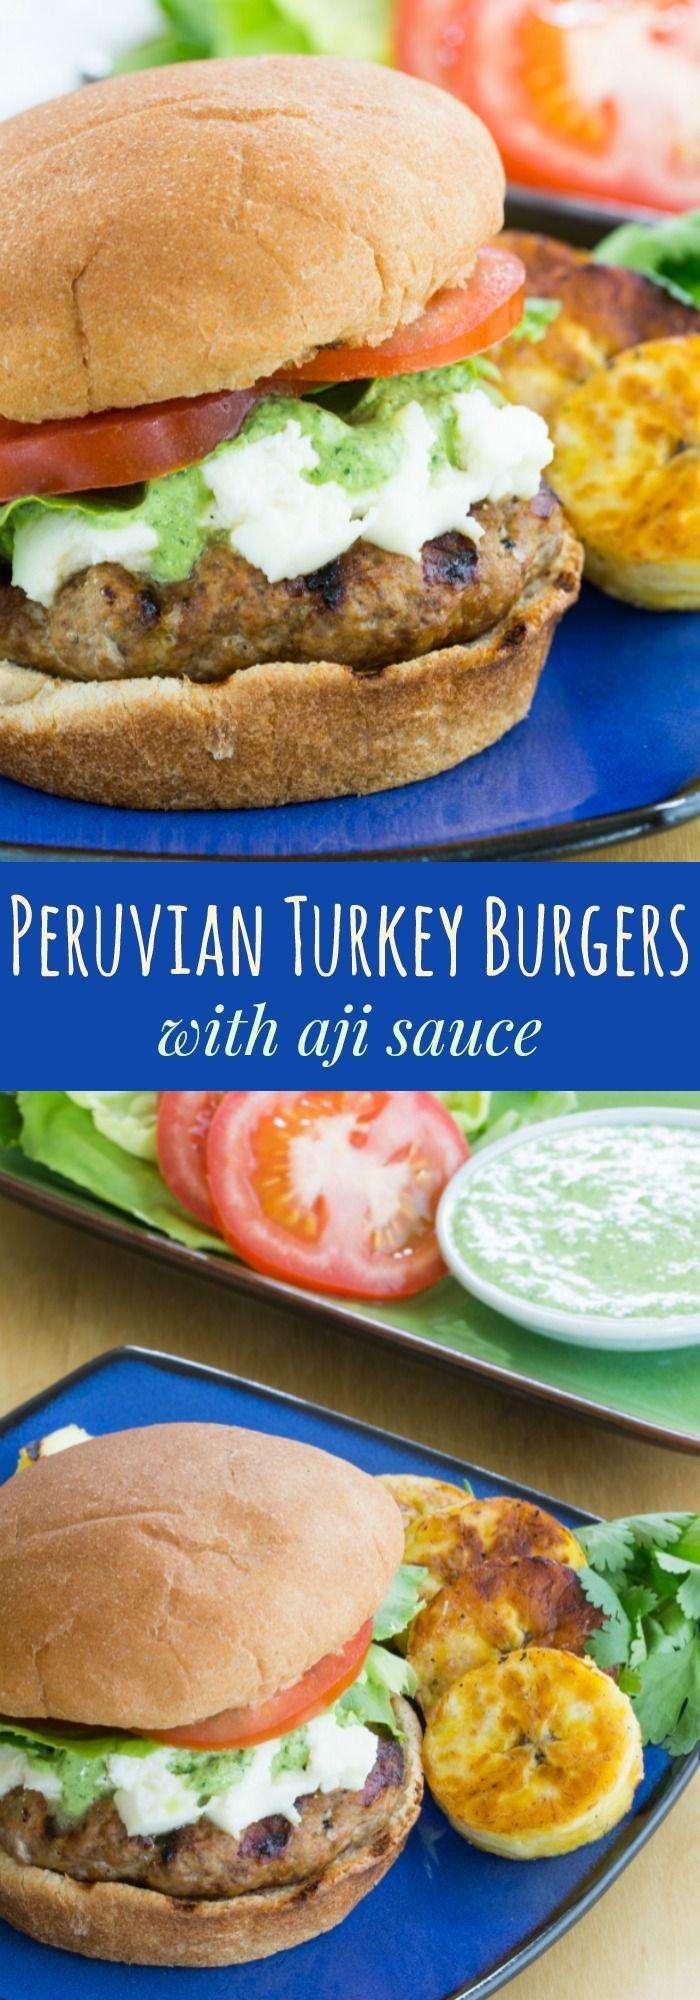 Peruvian Turkey Burgers with Aji Sauce